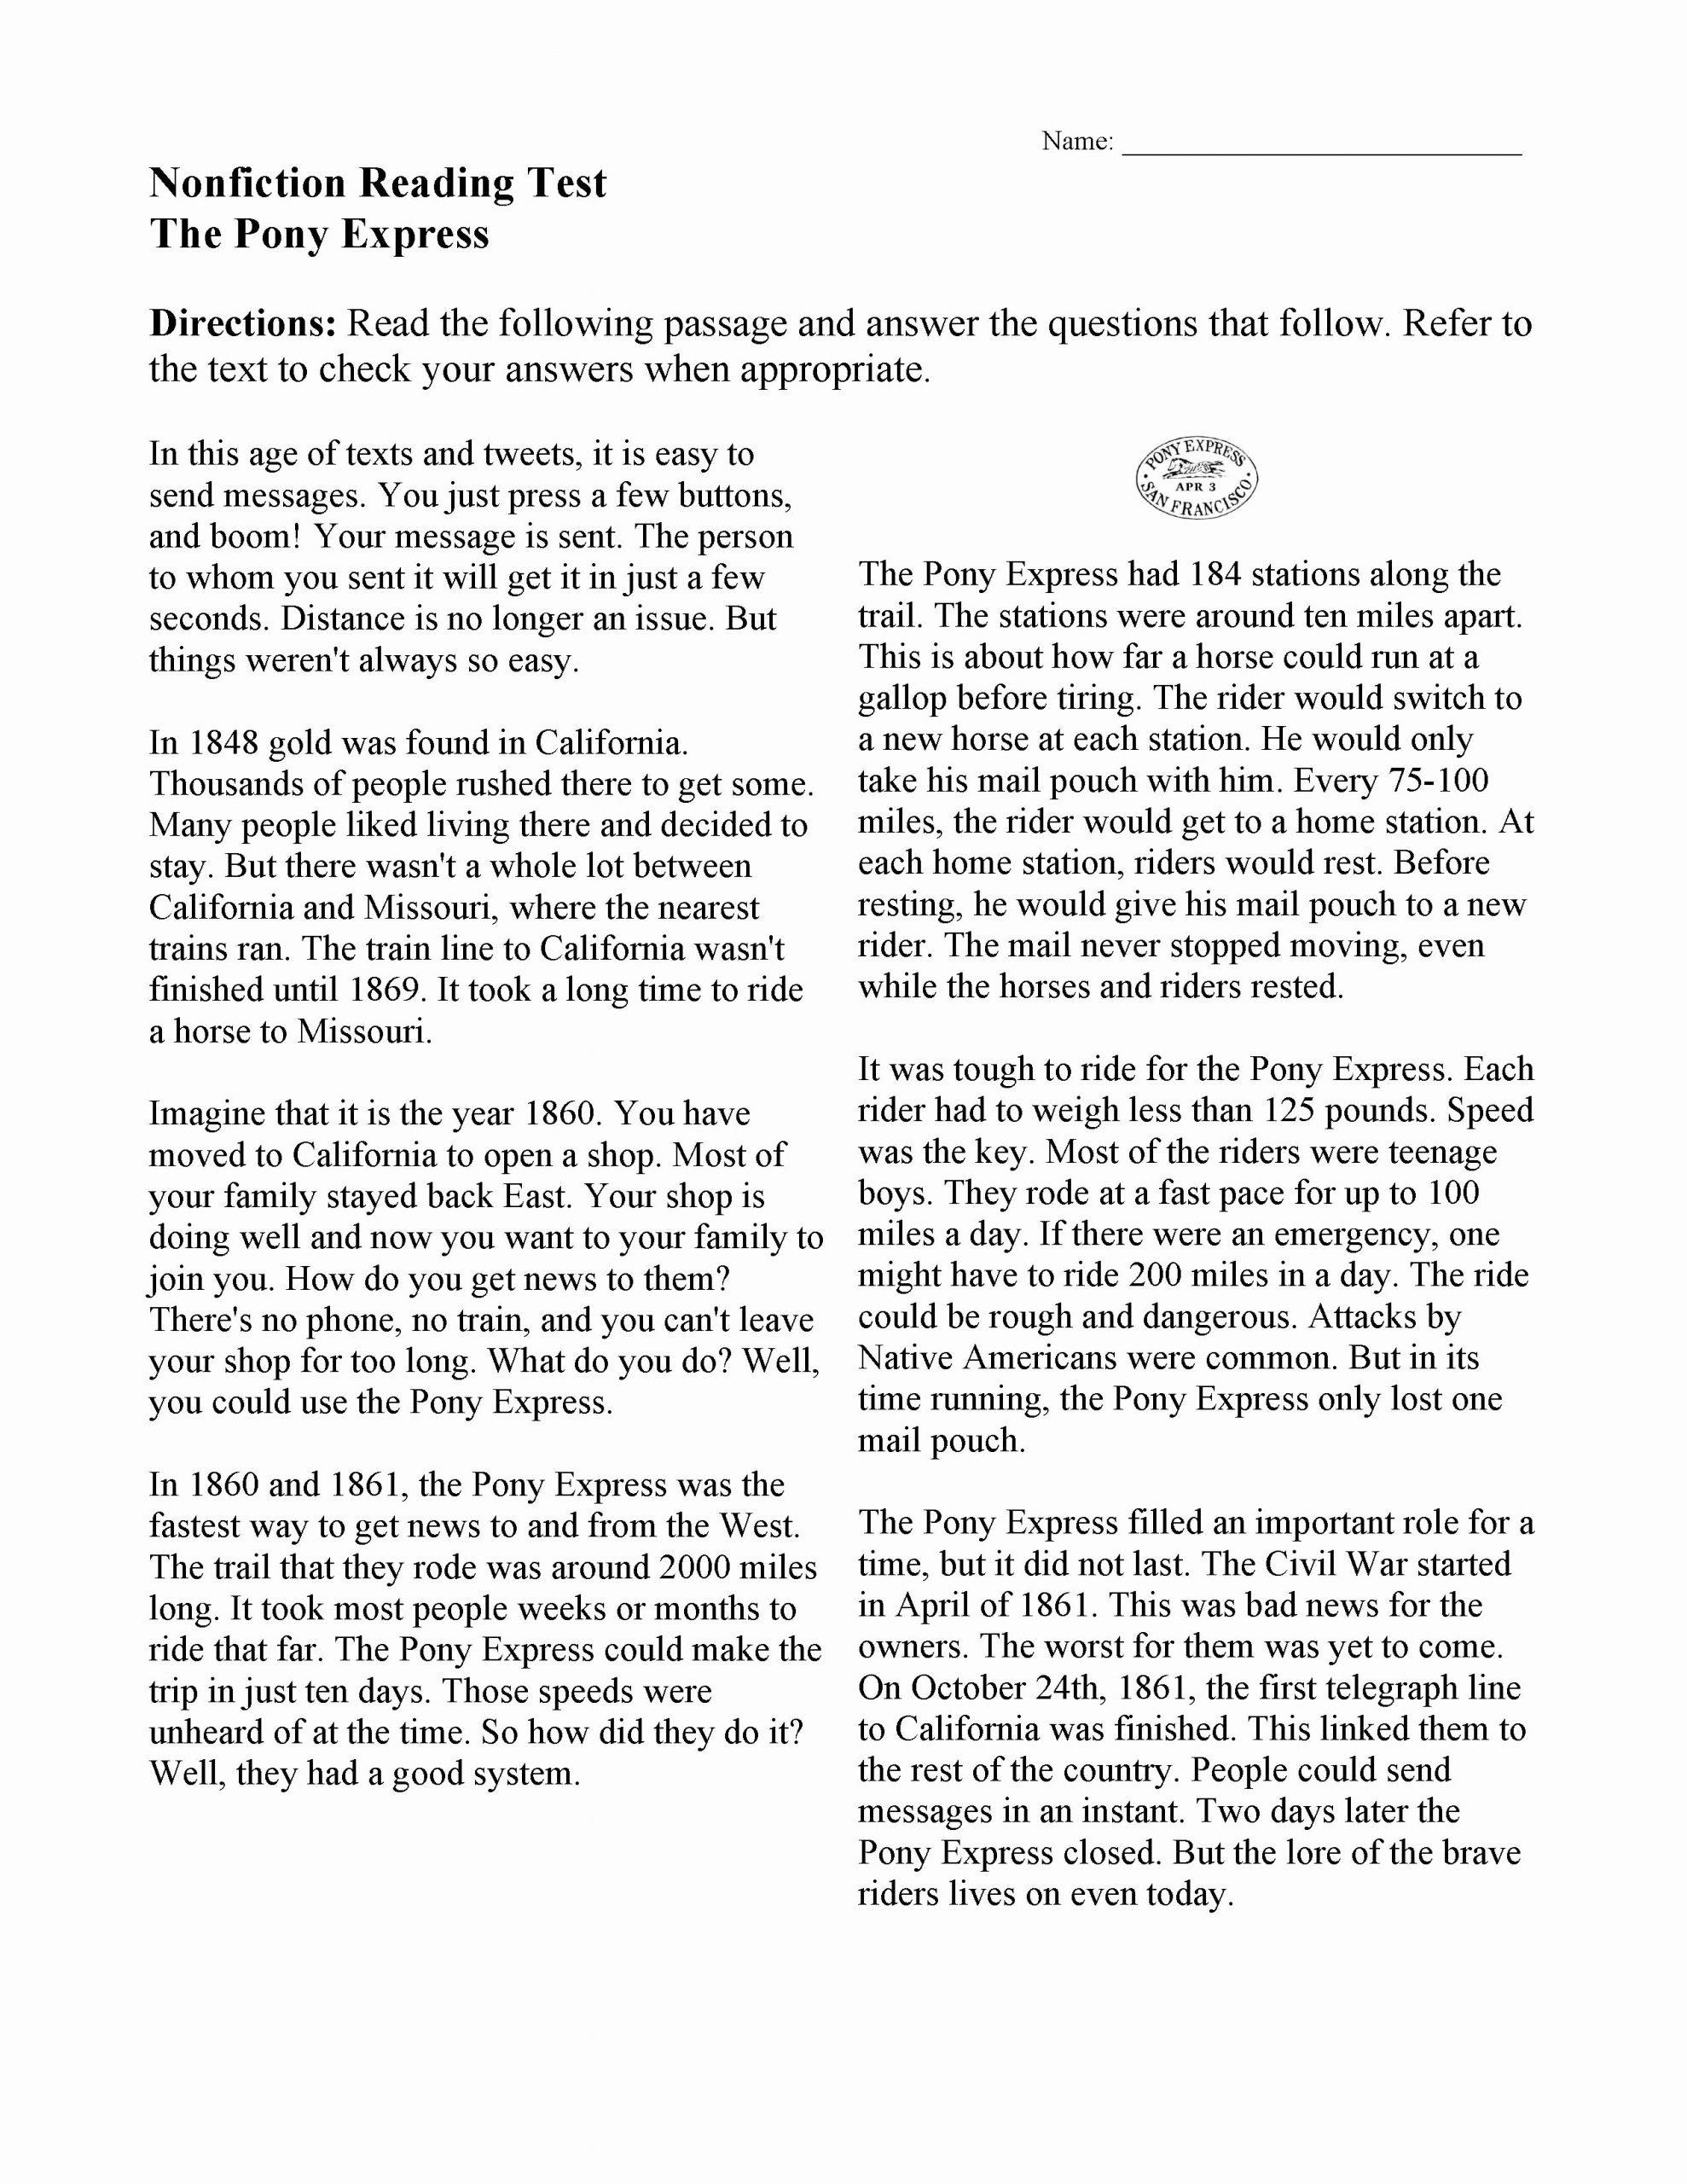 Reading Comprehension Worksheets 7th Grade Printable Reading Prehension Worksheets